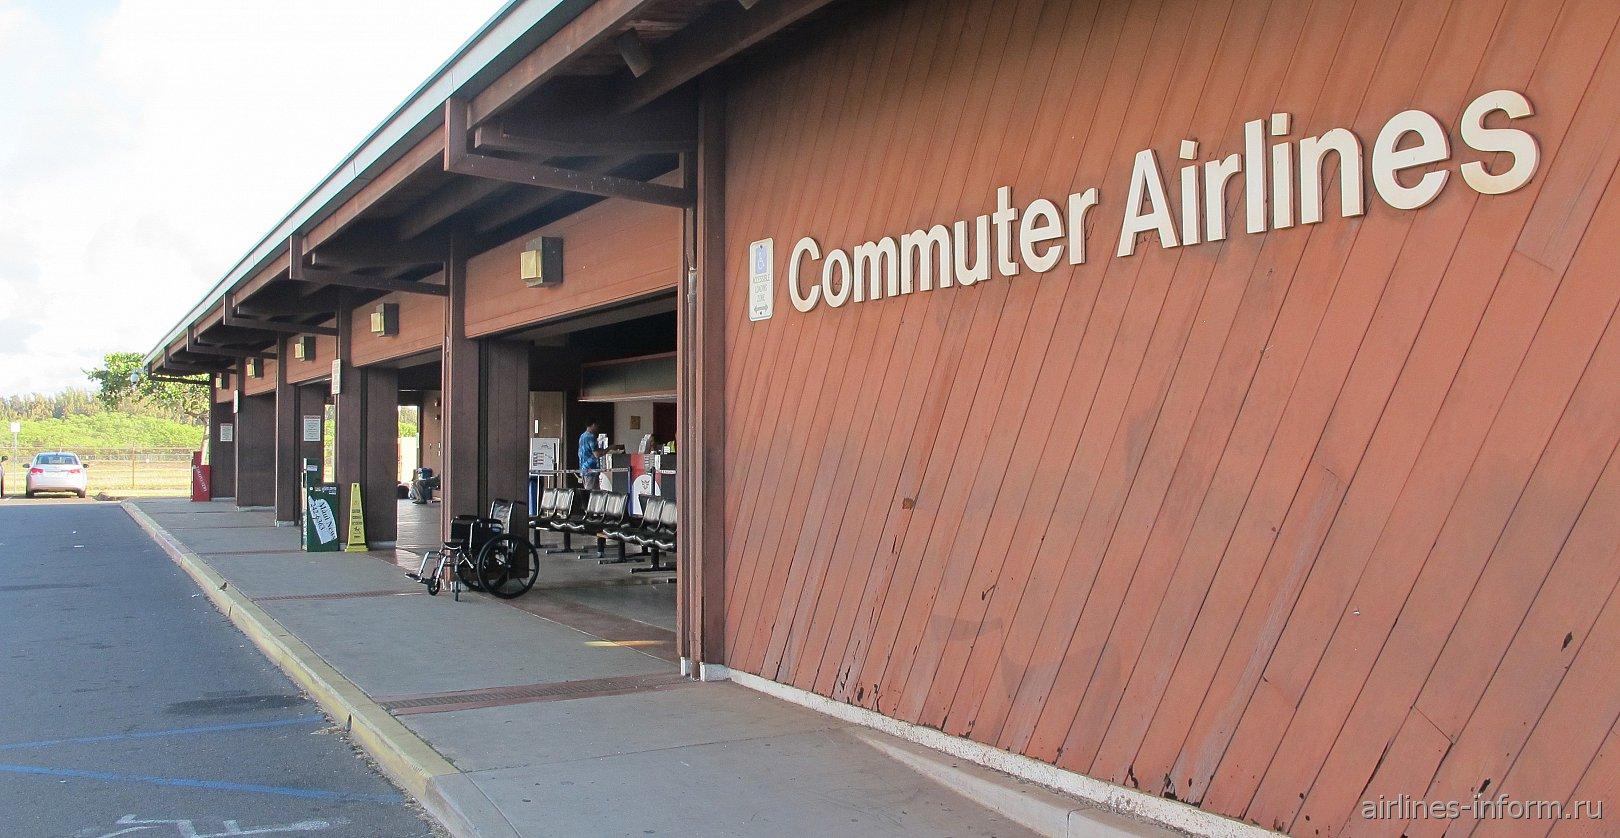 Вход в терминал местных авиалиний в аэропорту Кахулуи